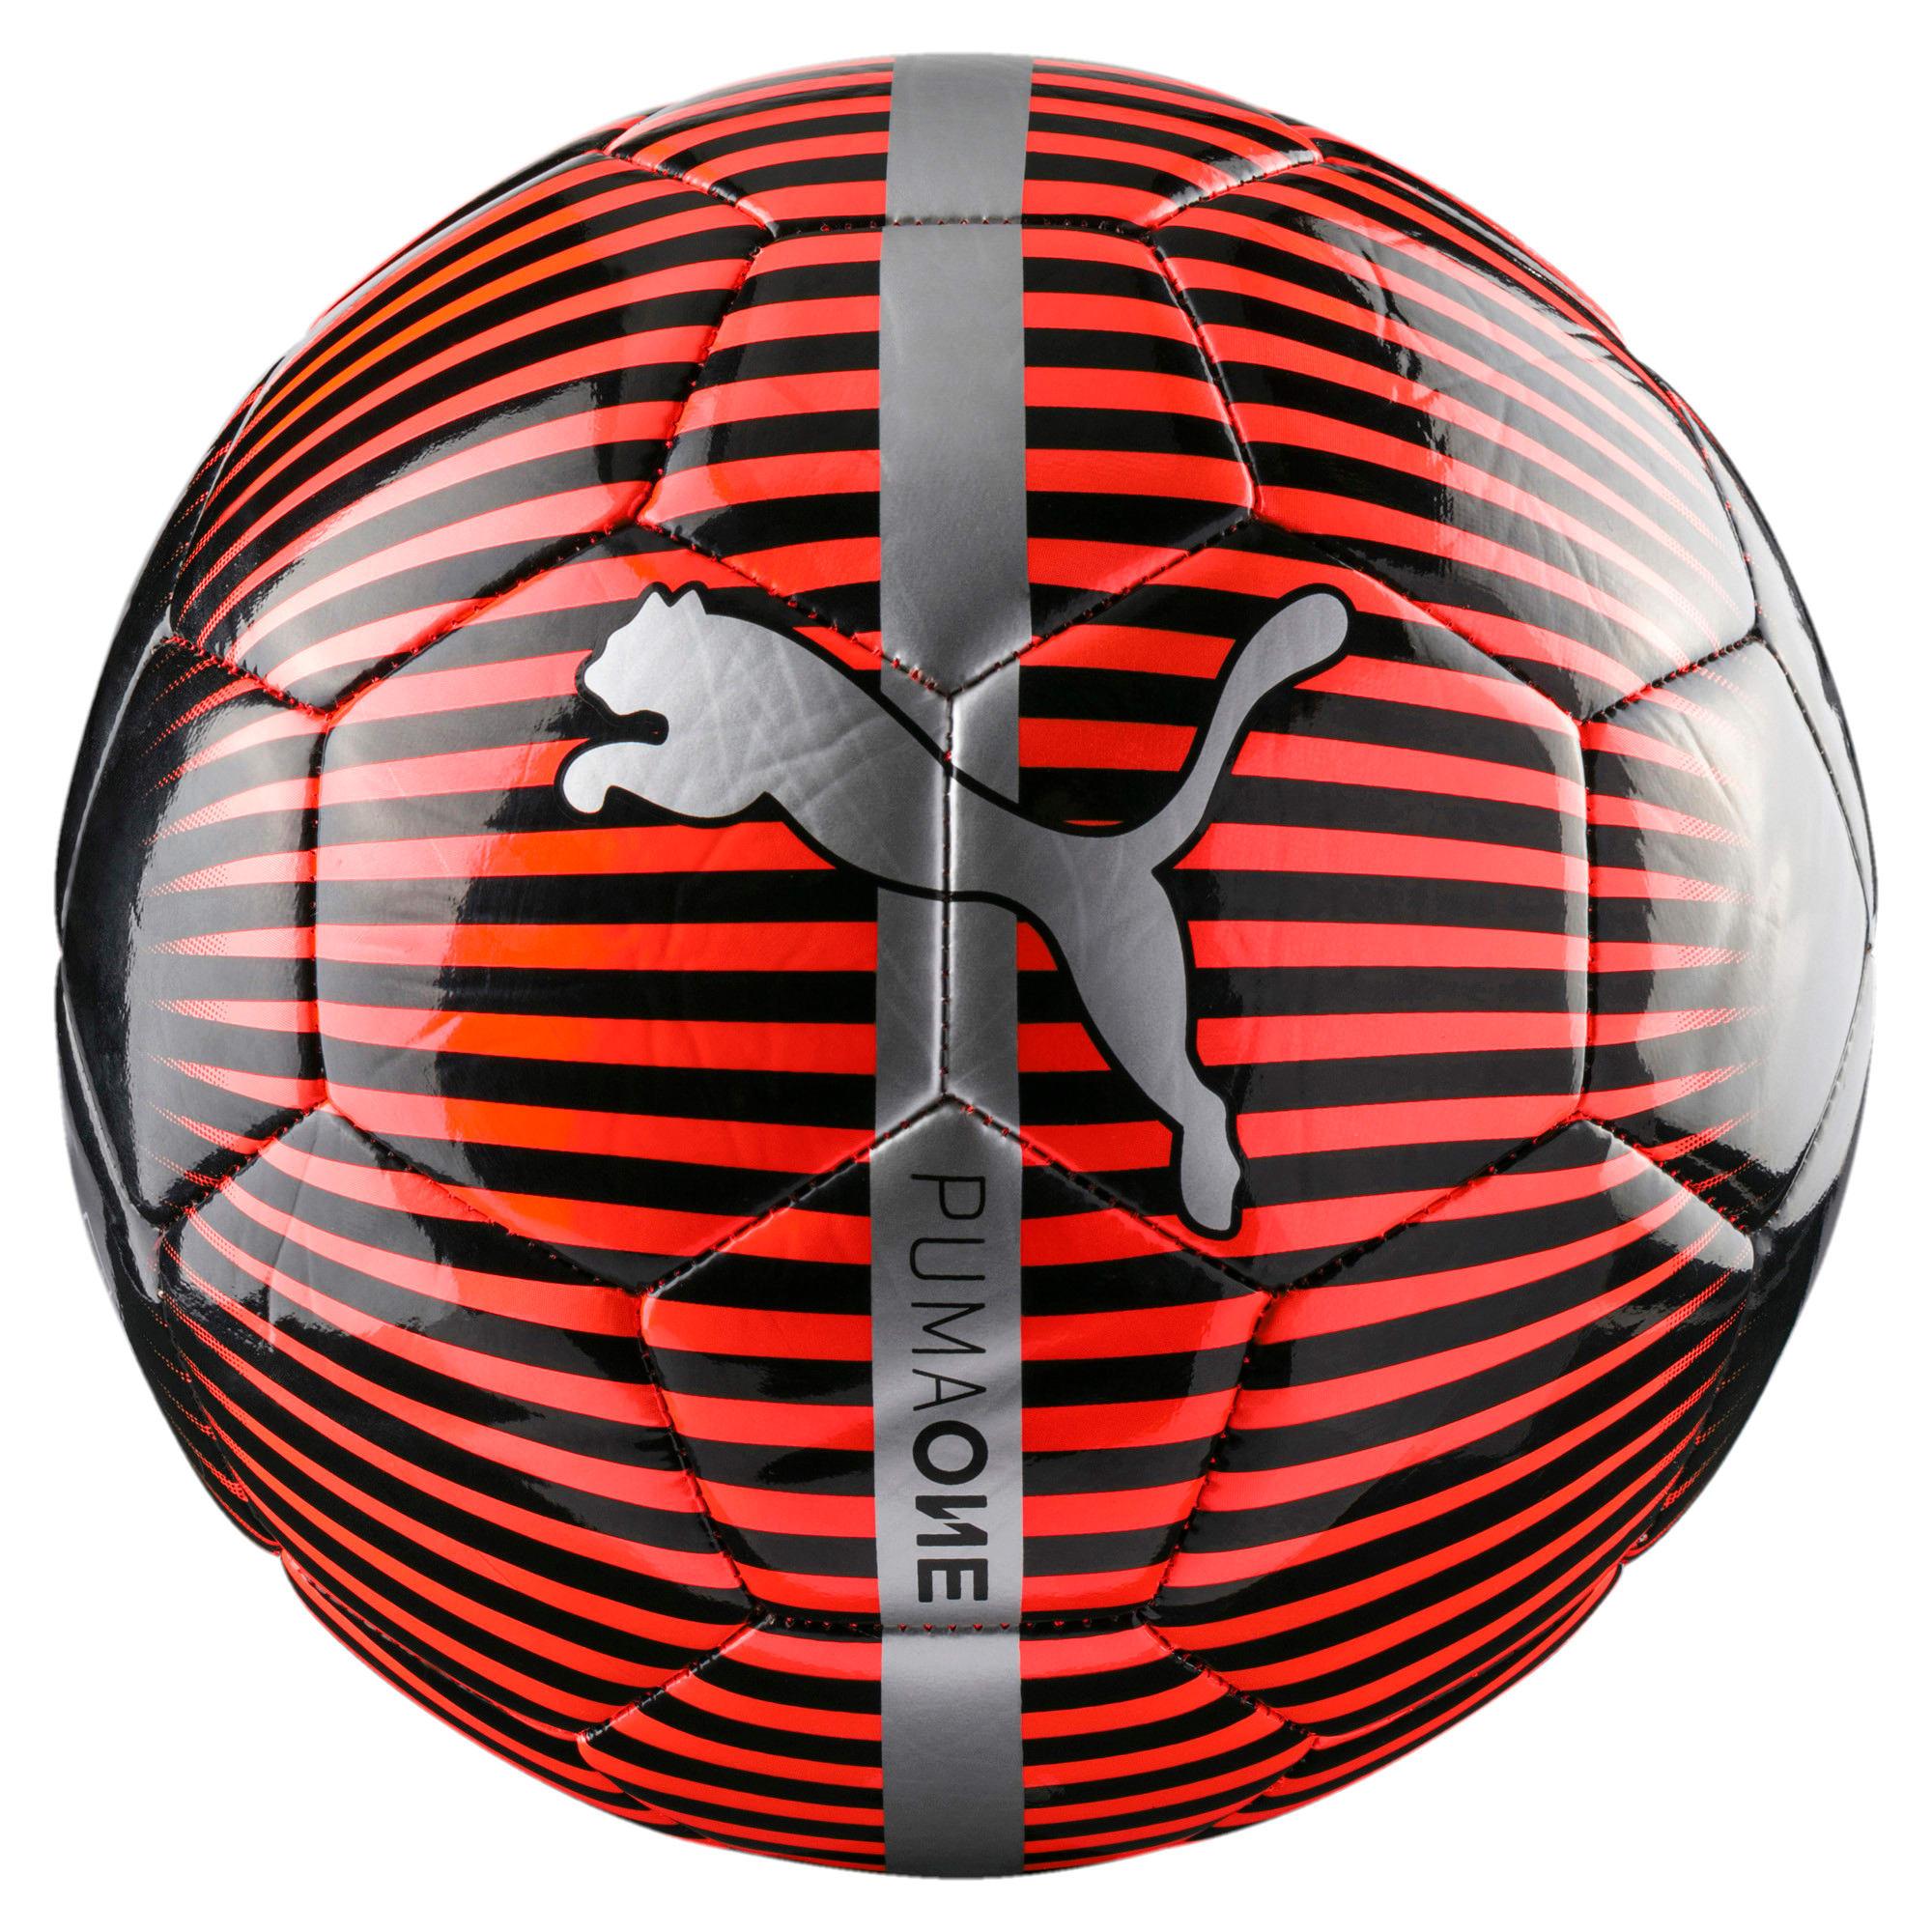 Thumbnail 1 of ONE Chrome Football, Red Blast-Puma Black-Silver, medium-IND